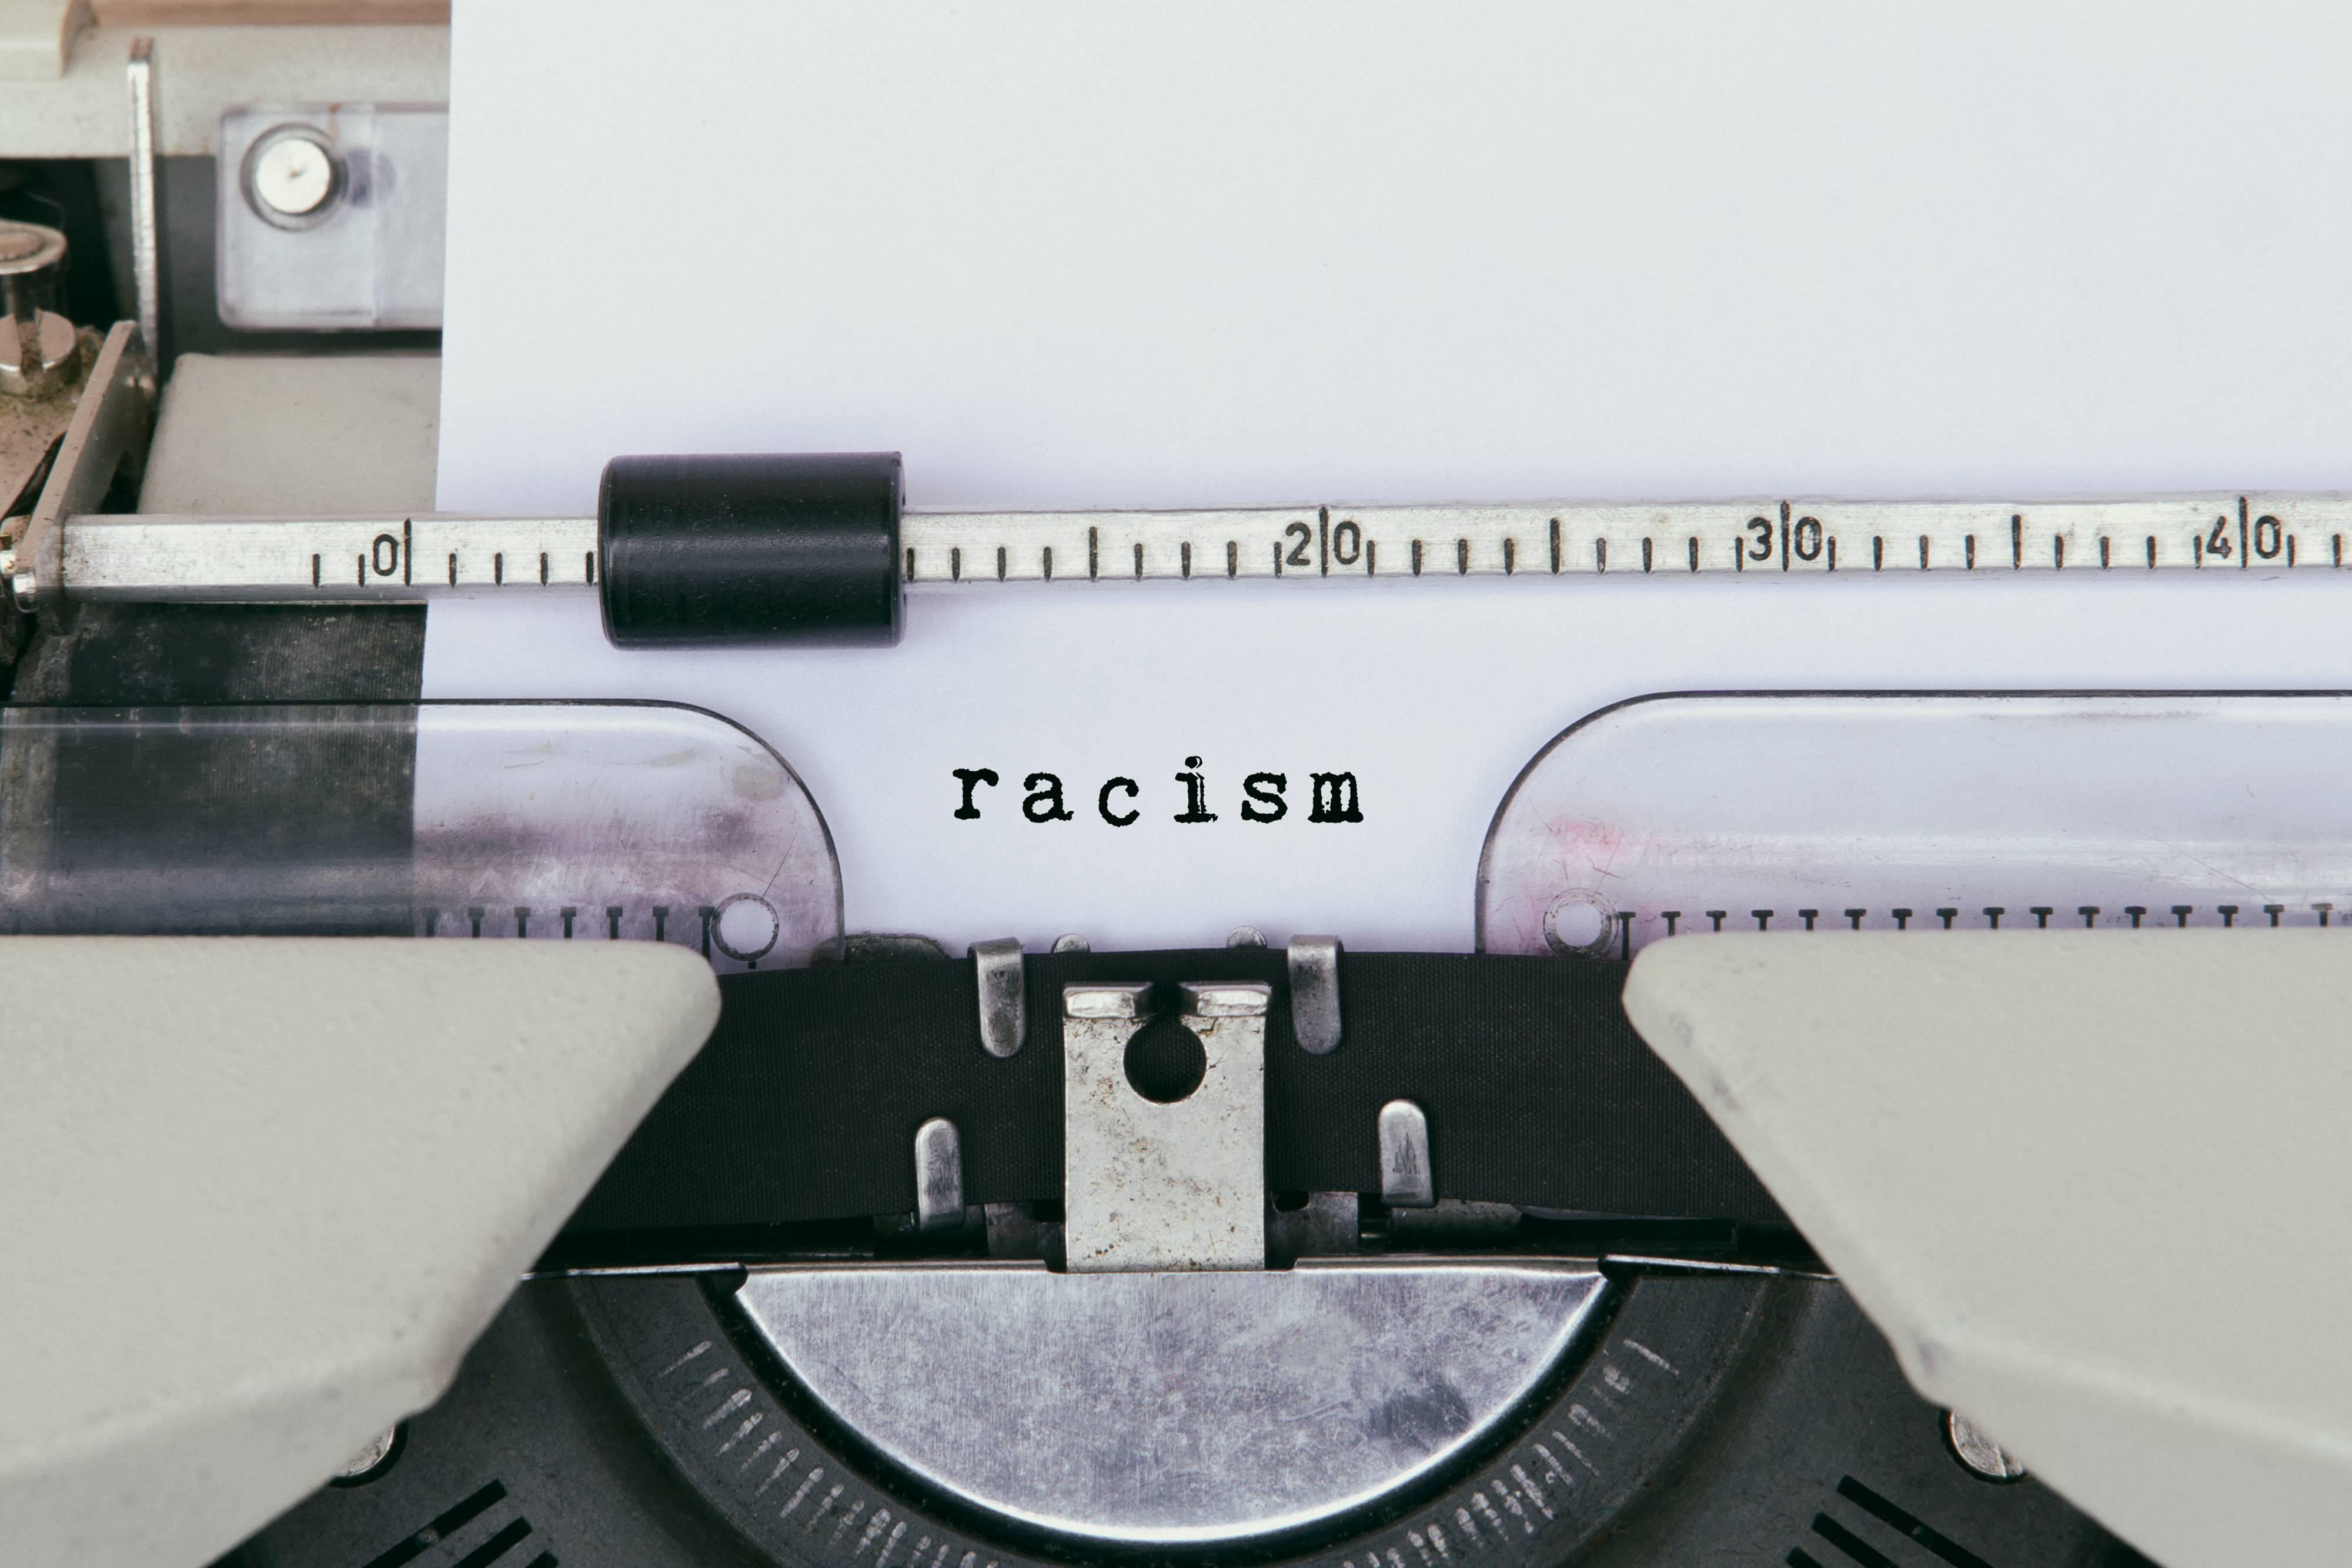 Racism Typed on Vintage Typewriter